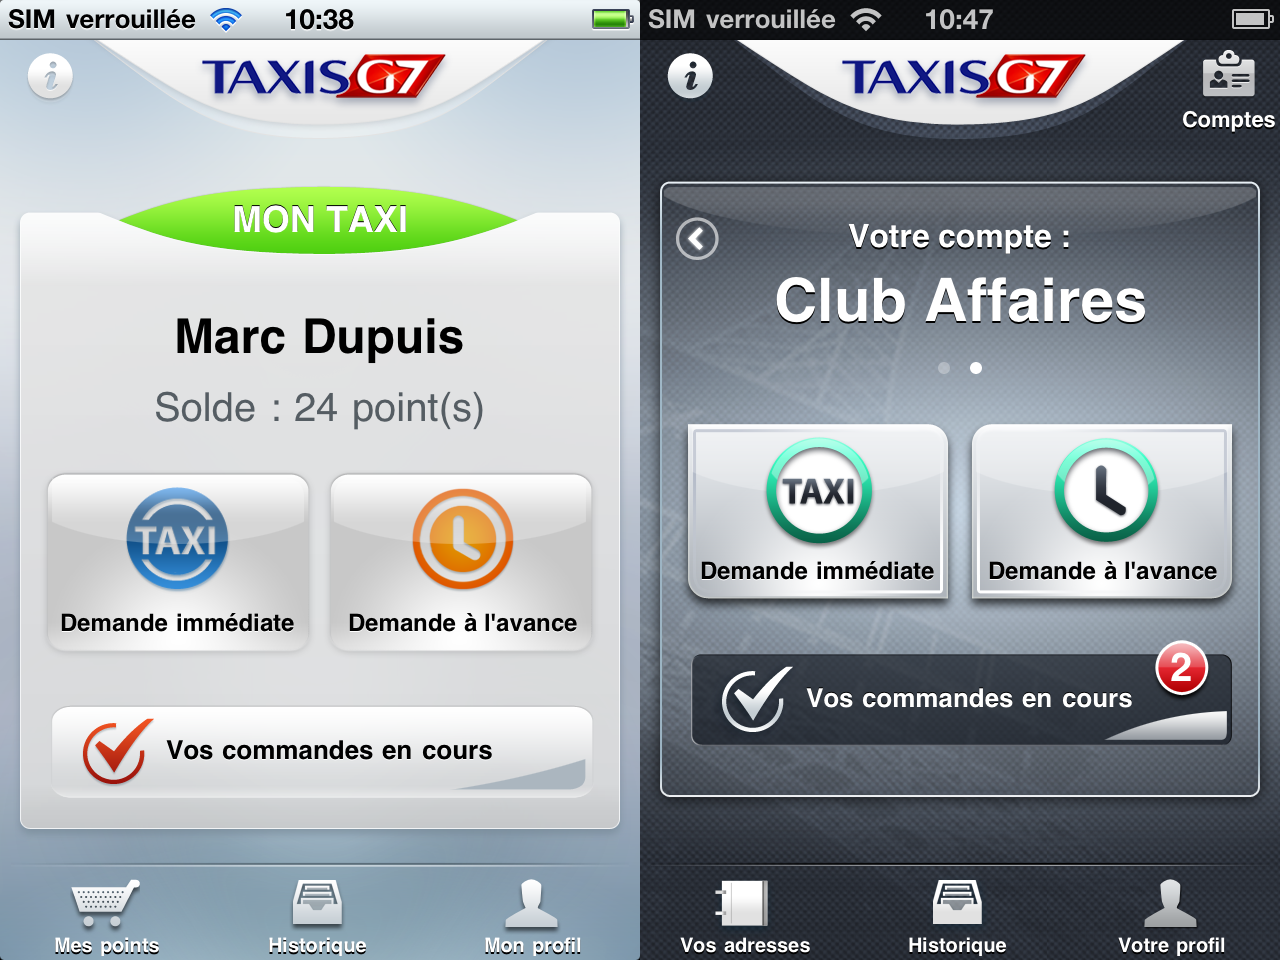 des taxis g7 prioritaires gr ce une appli depuis l iphone paperblog. Black Bedroom Furniture Sets. Home Design Ideas